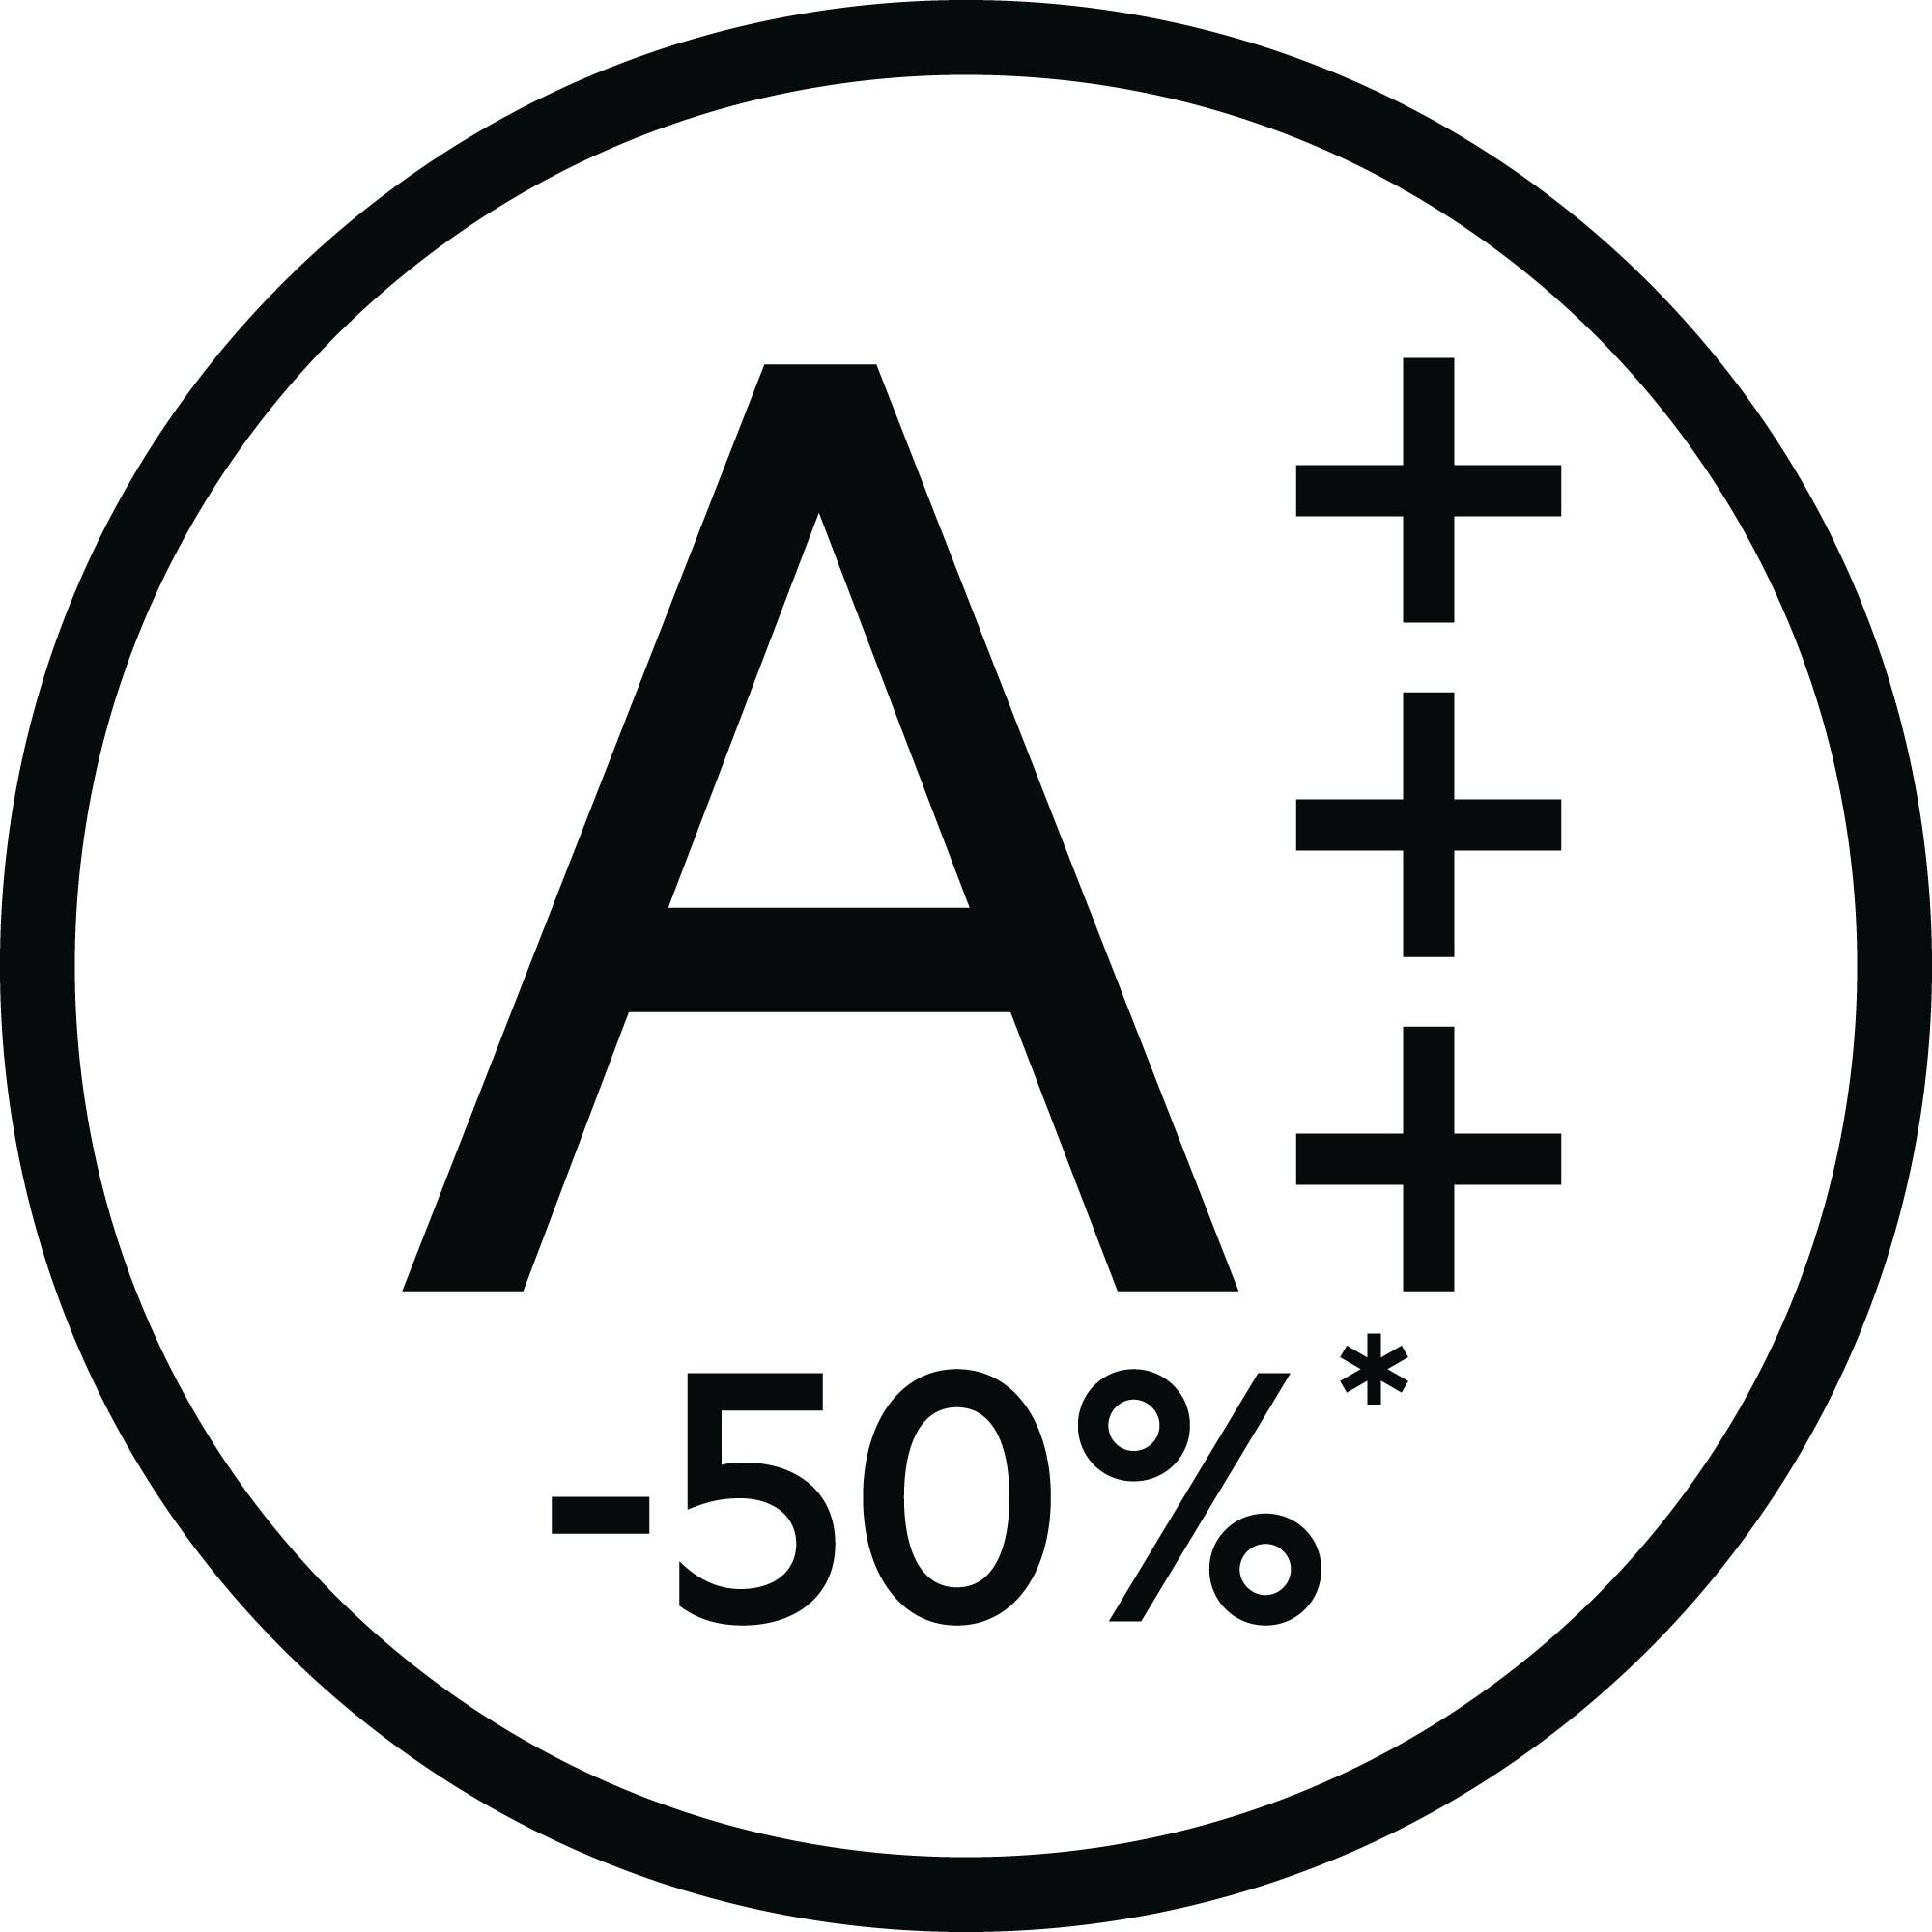 Energy_Efficiency_A+++_50percent-PSAAFL16PC569009.jpg